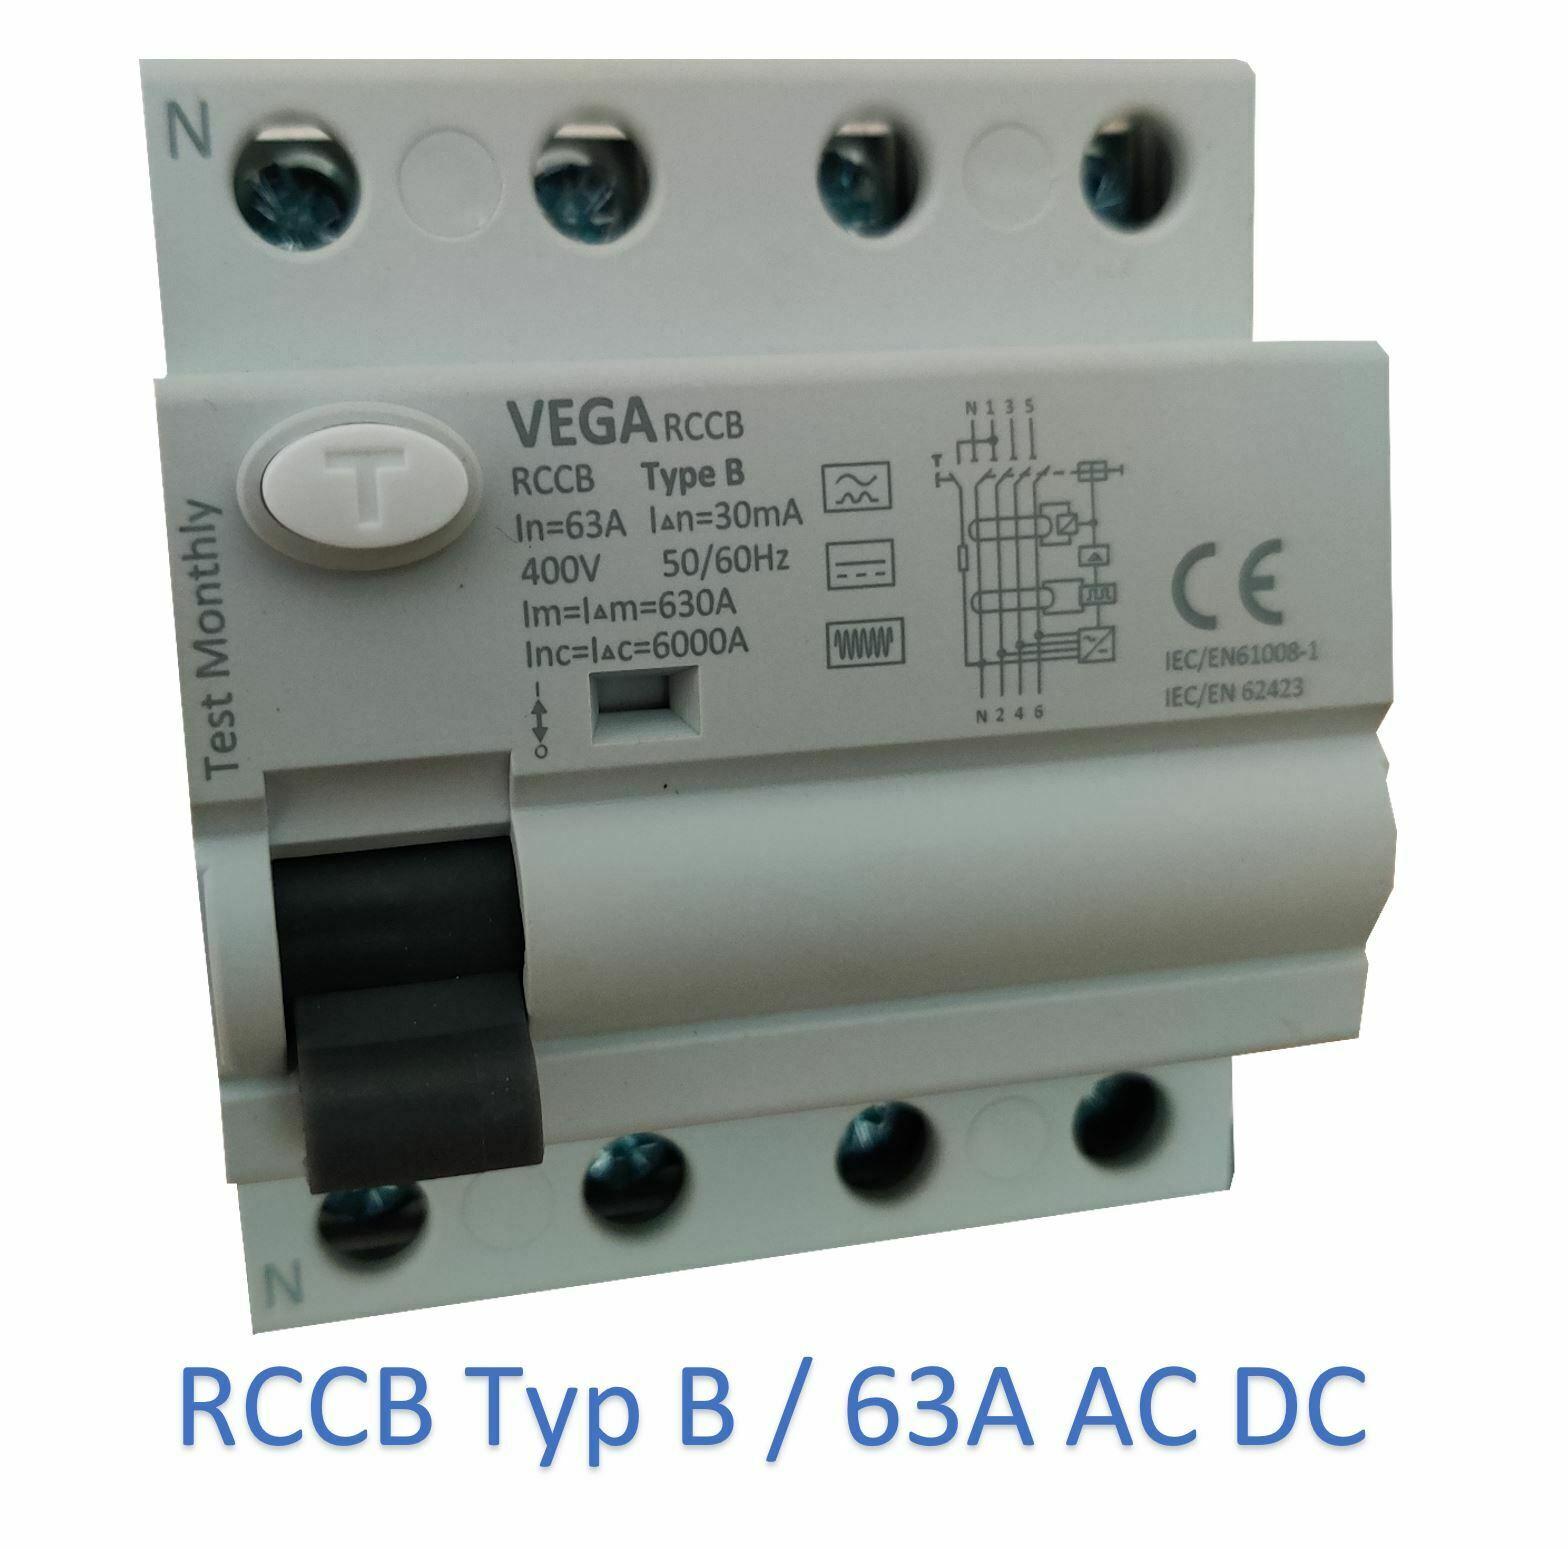 Vega RCCB FI Fehlerstromschutzschalter 63A 4-pol. Typ B Elektroauto PV Anlage